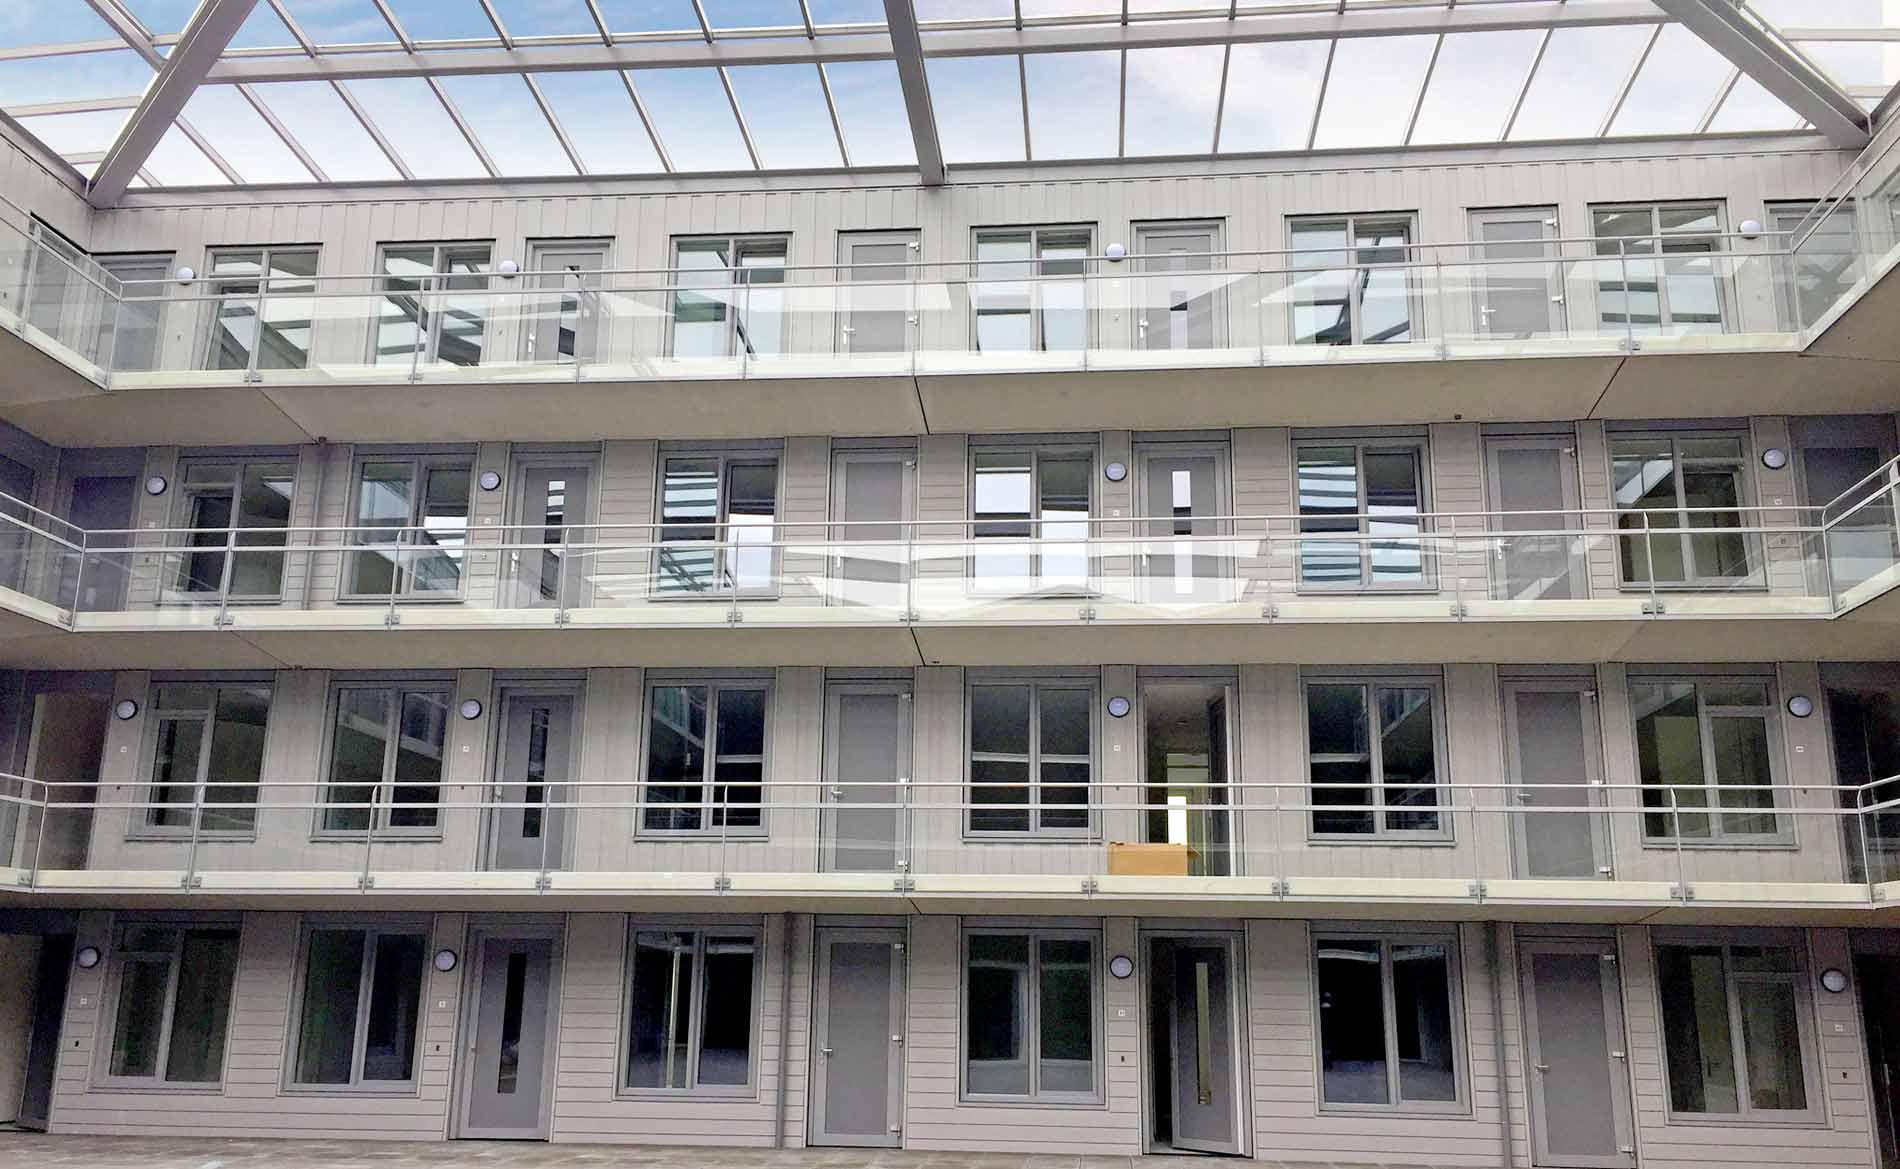 architect appartementen supermarkt Deen Bangert Oosterpolder Zwaag Hoorn Grootslag BBHD architecten